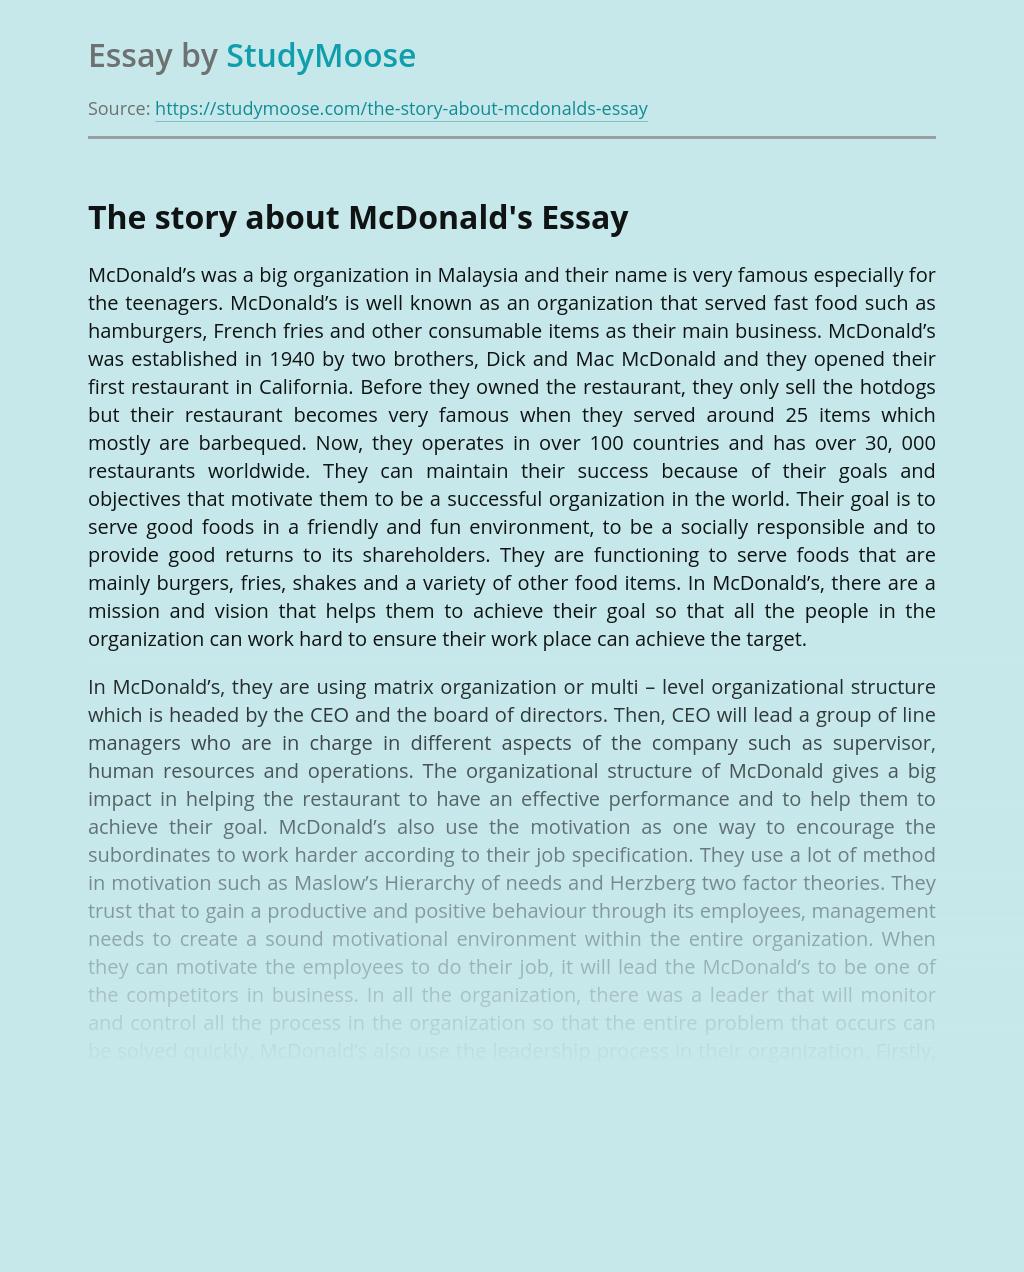 McDonald's Fast Food Restaurants in Malaysia